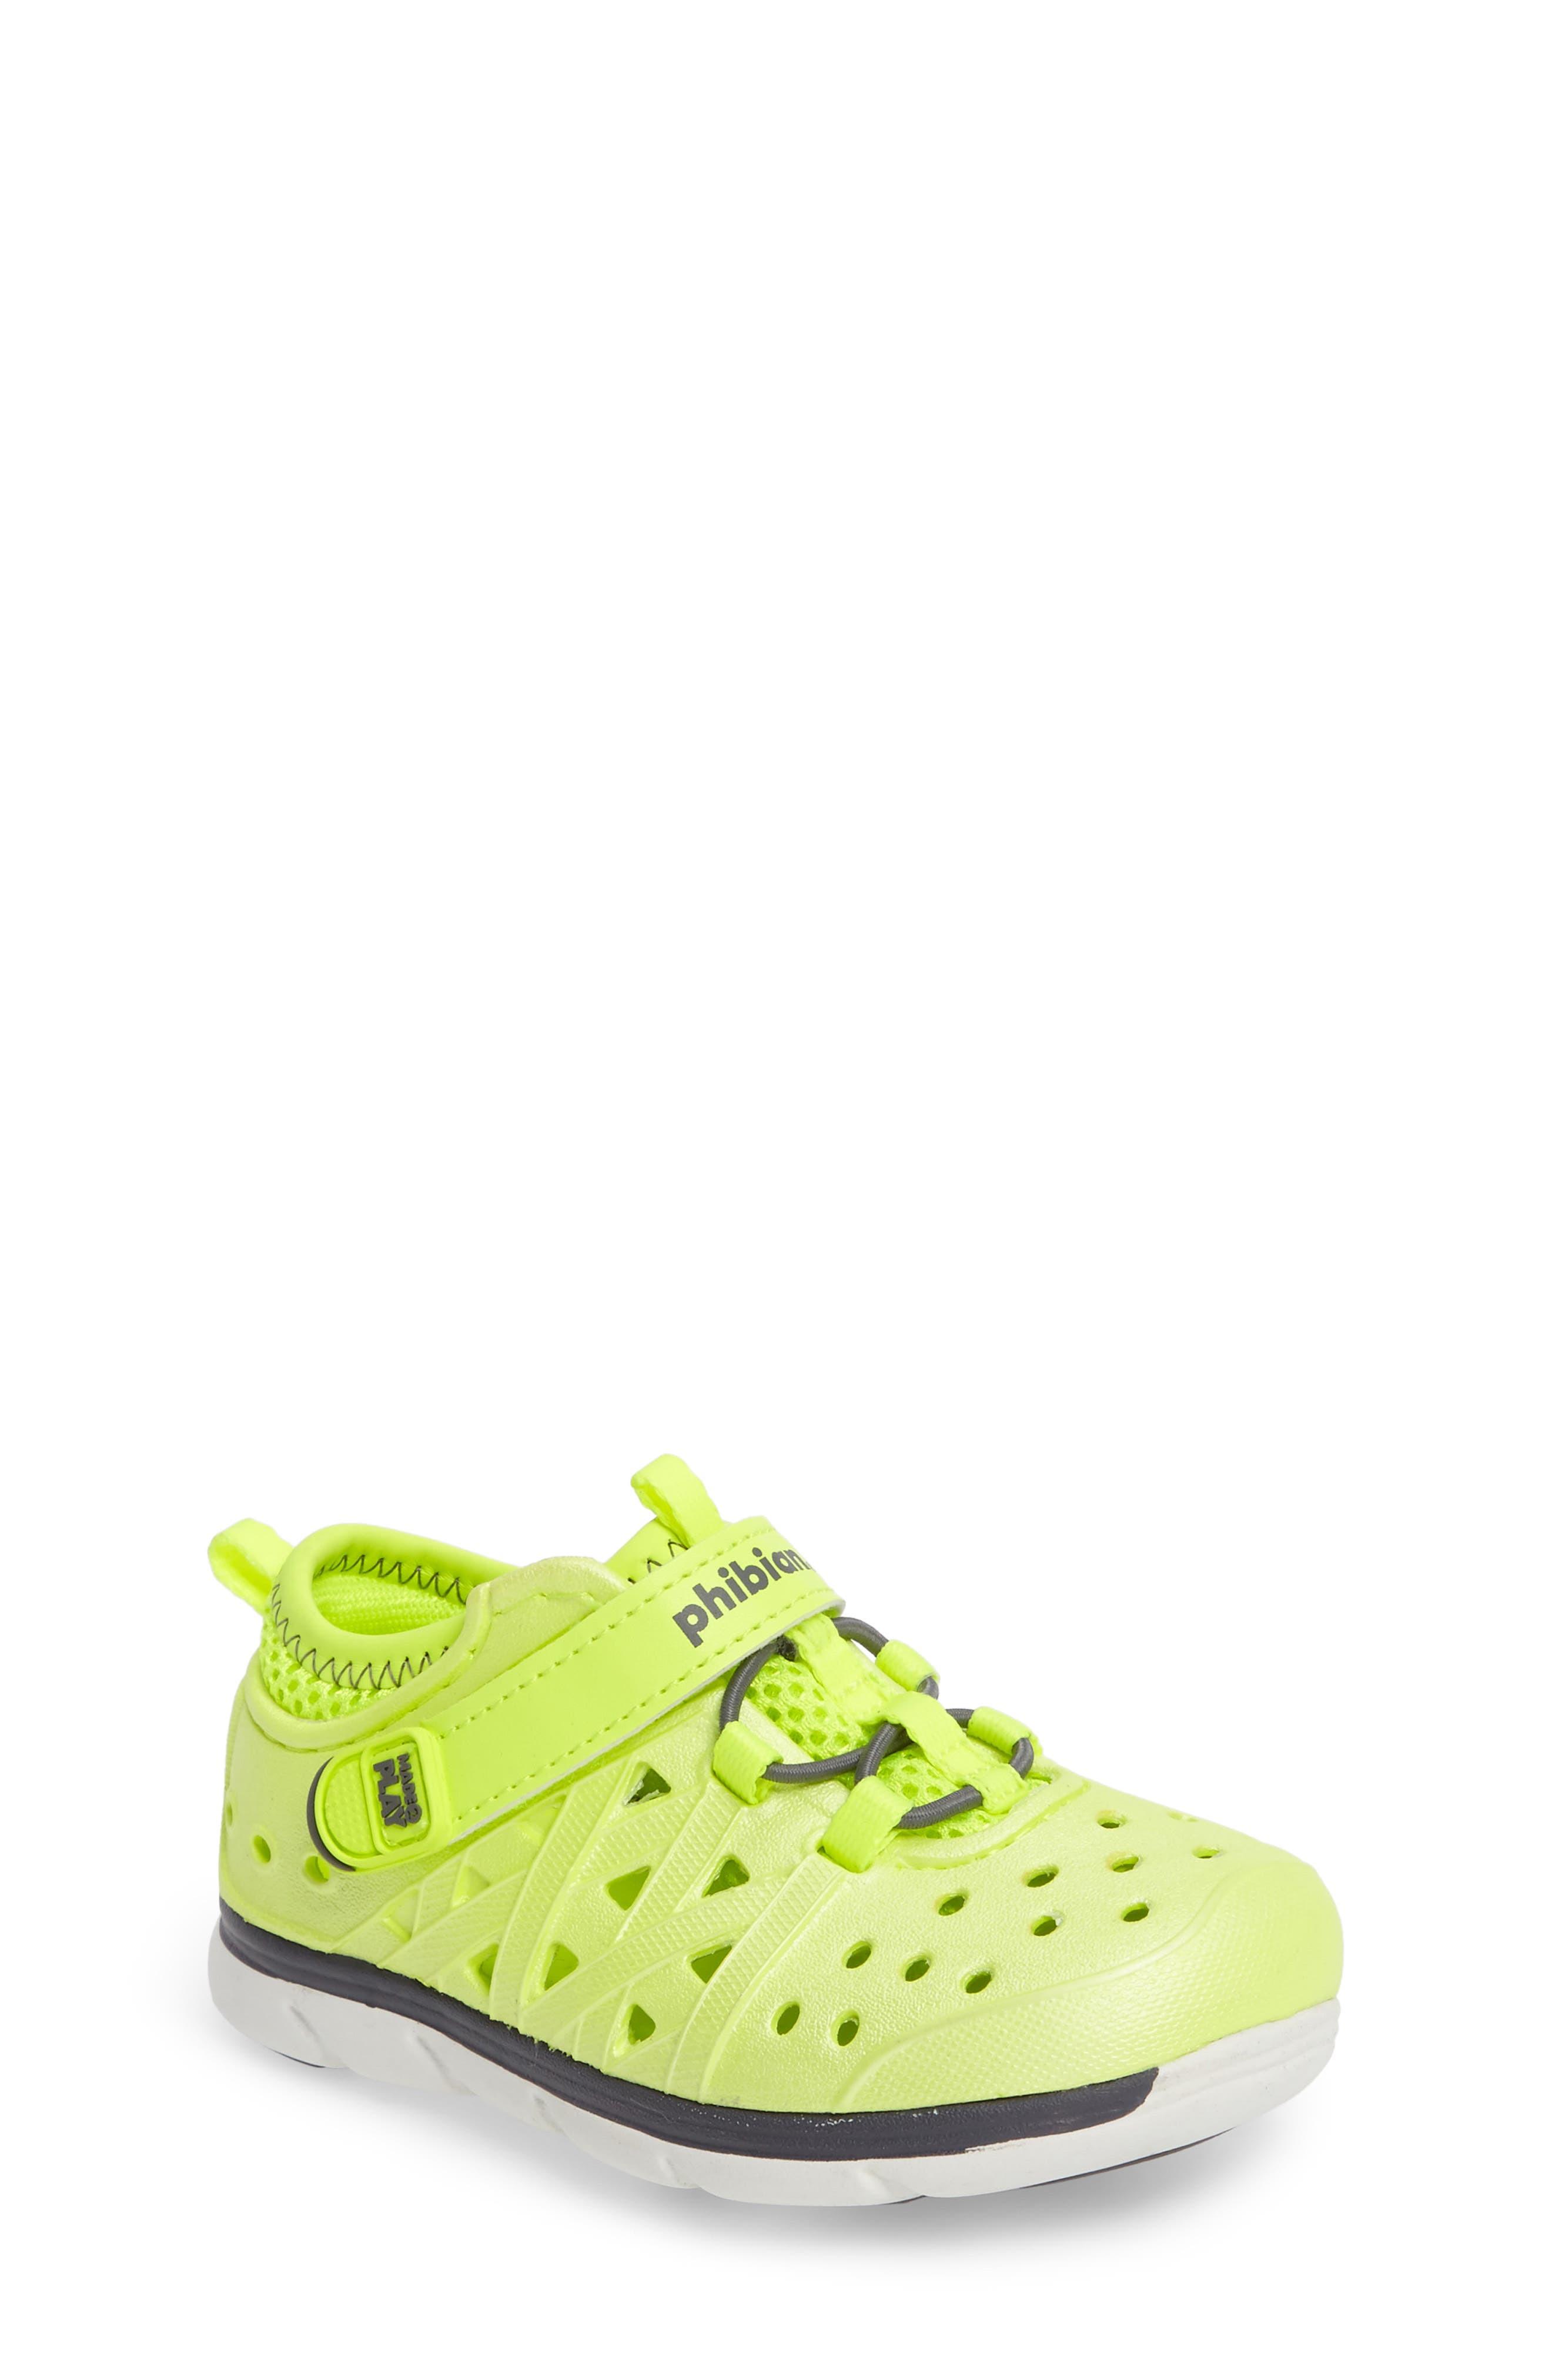 Made2Play<sup>®</sup> Phibian Sneaker,                             Main thumbnail 1, color,                             Citron Metallic